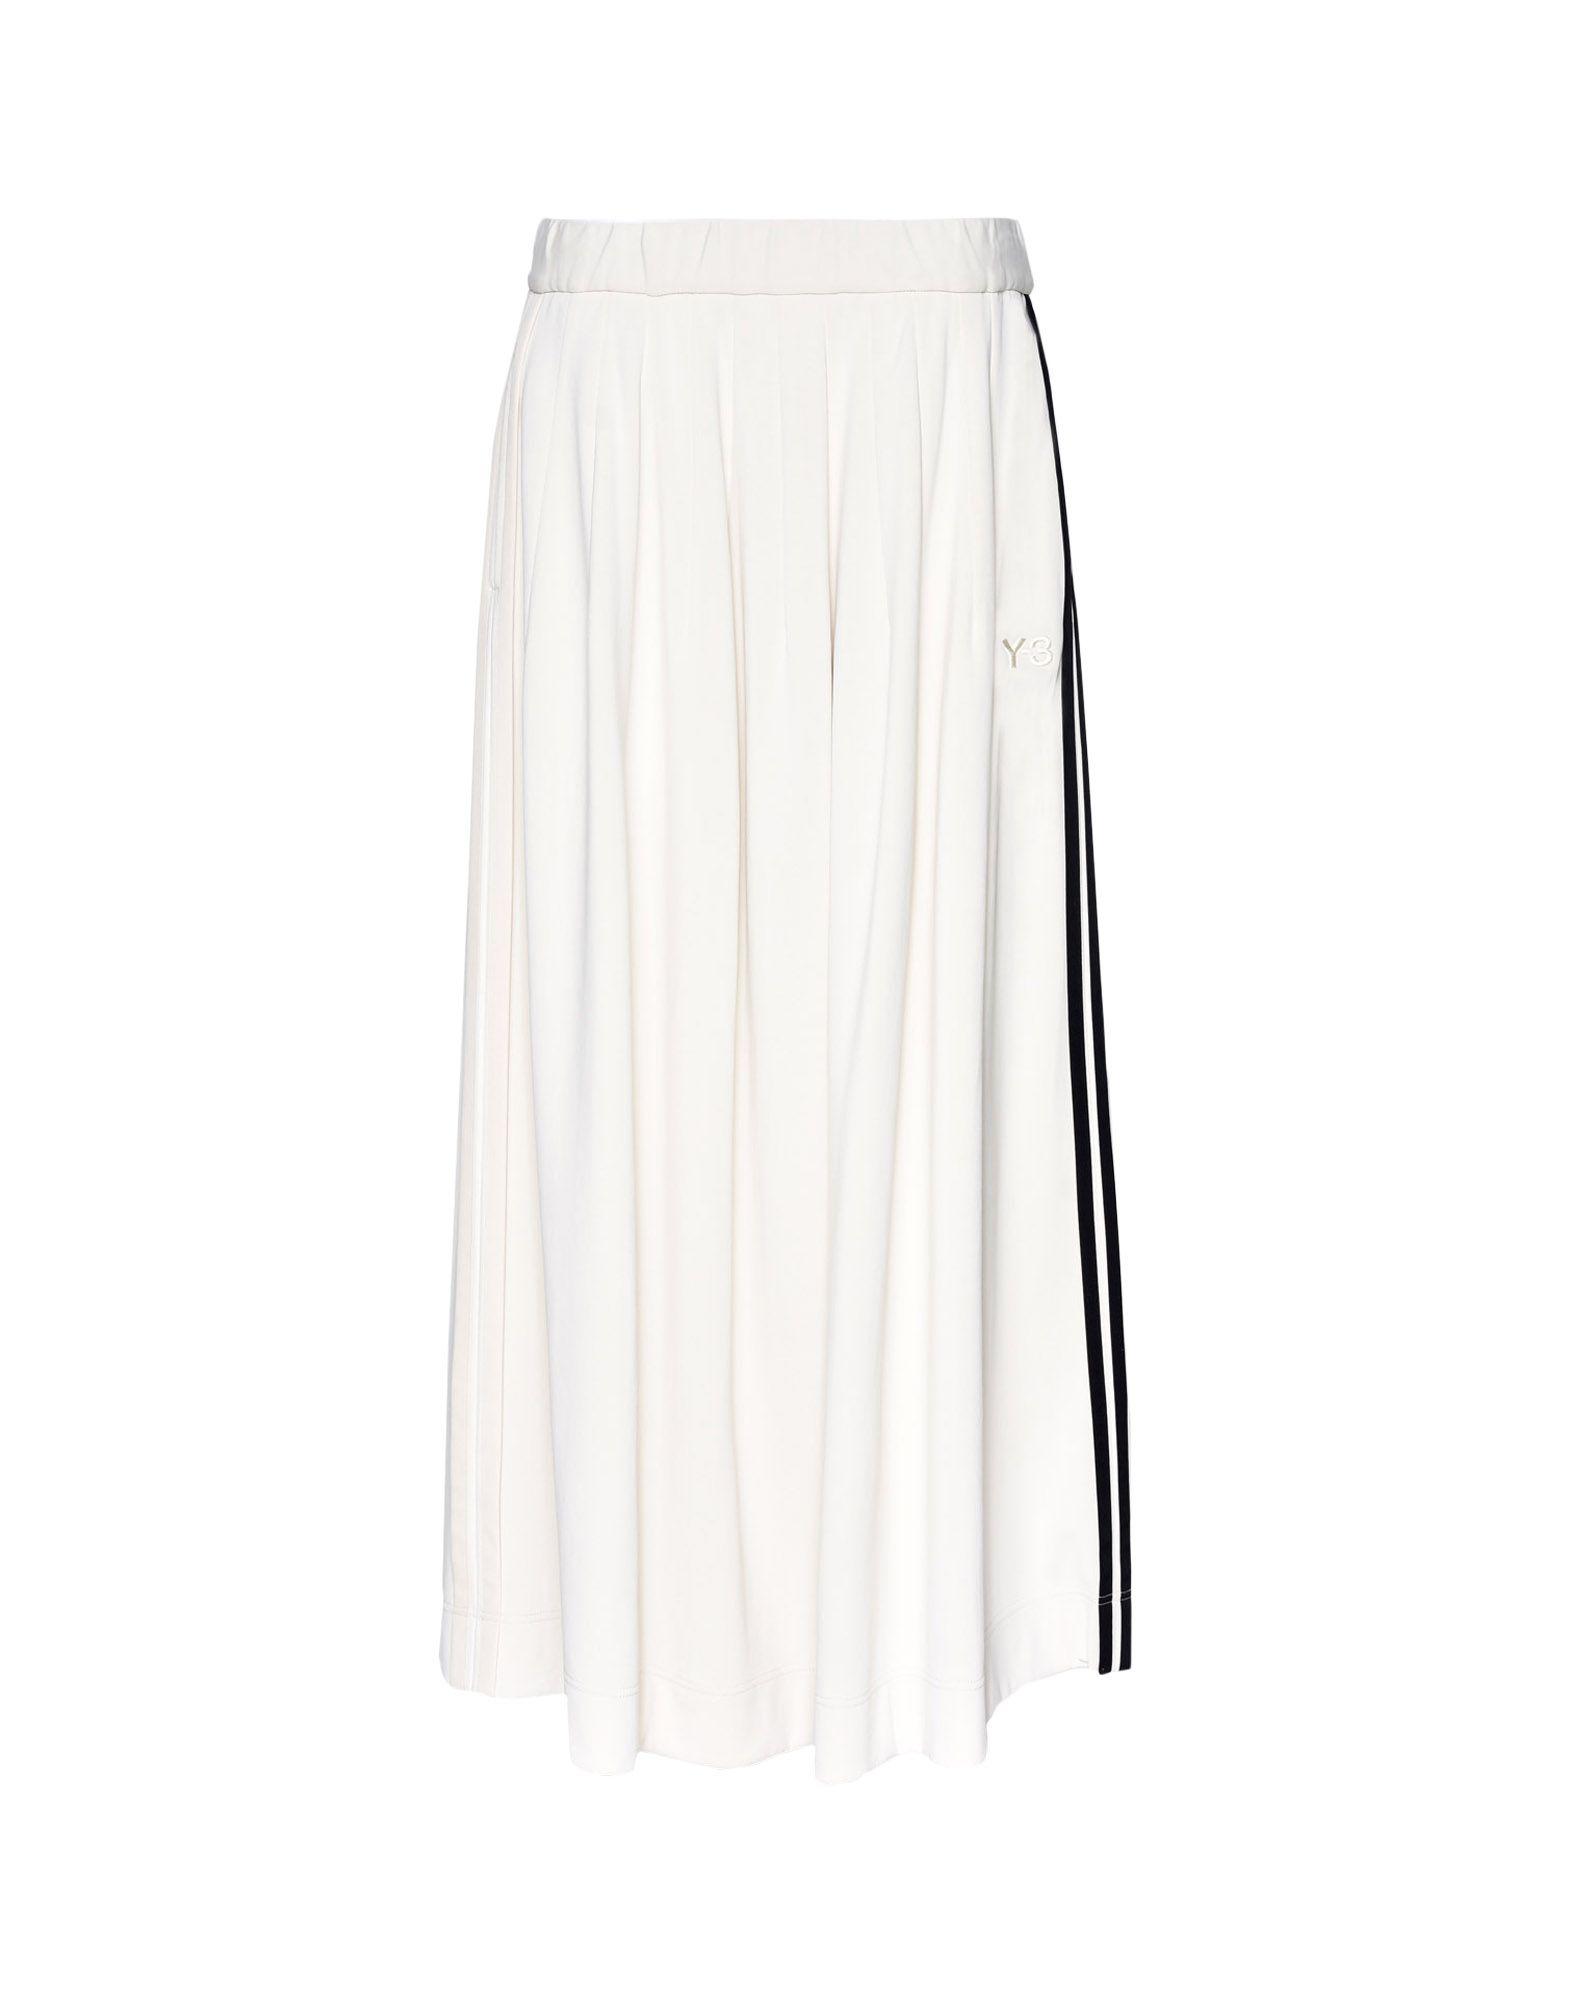 Y-3 Y-3 3-Stripes Selvedge Matte Track Skirt Gonna ginocchio Donna f